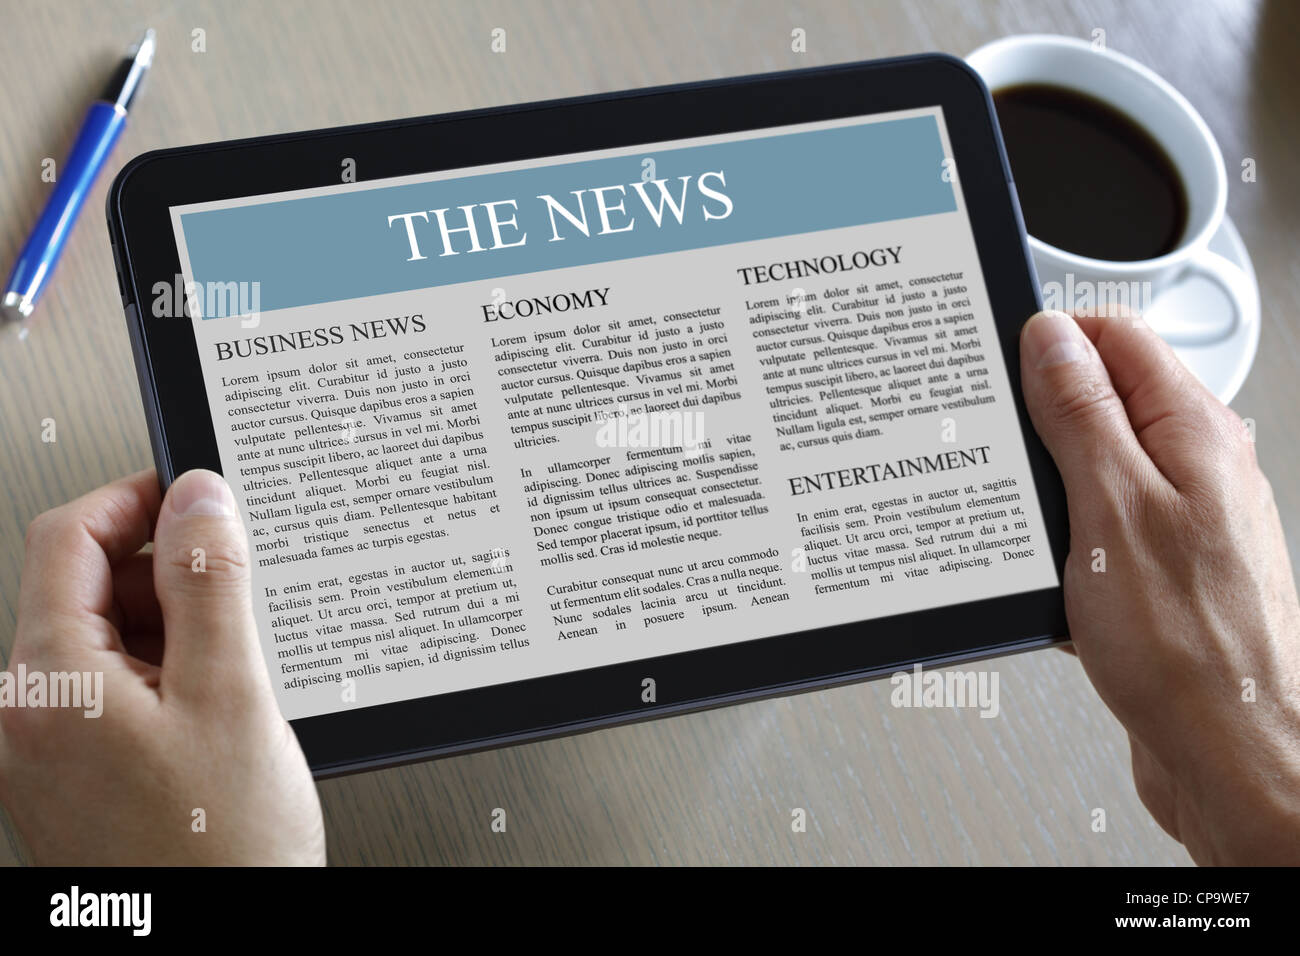 Digital tablet showing news - Stock Image